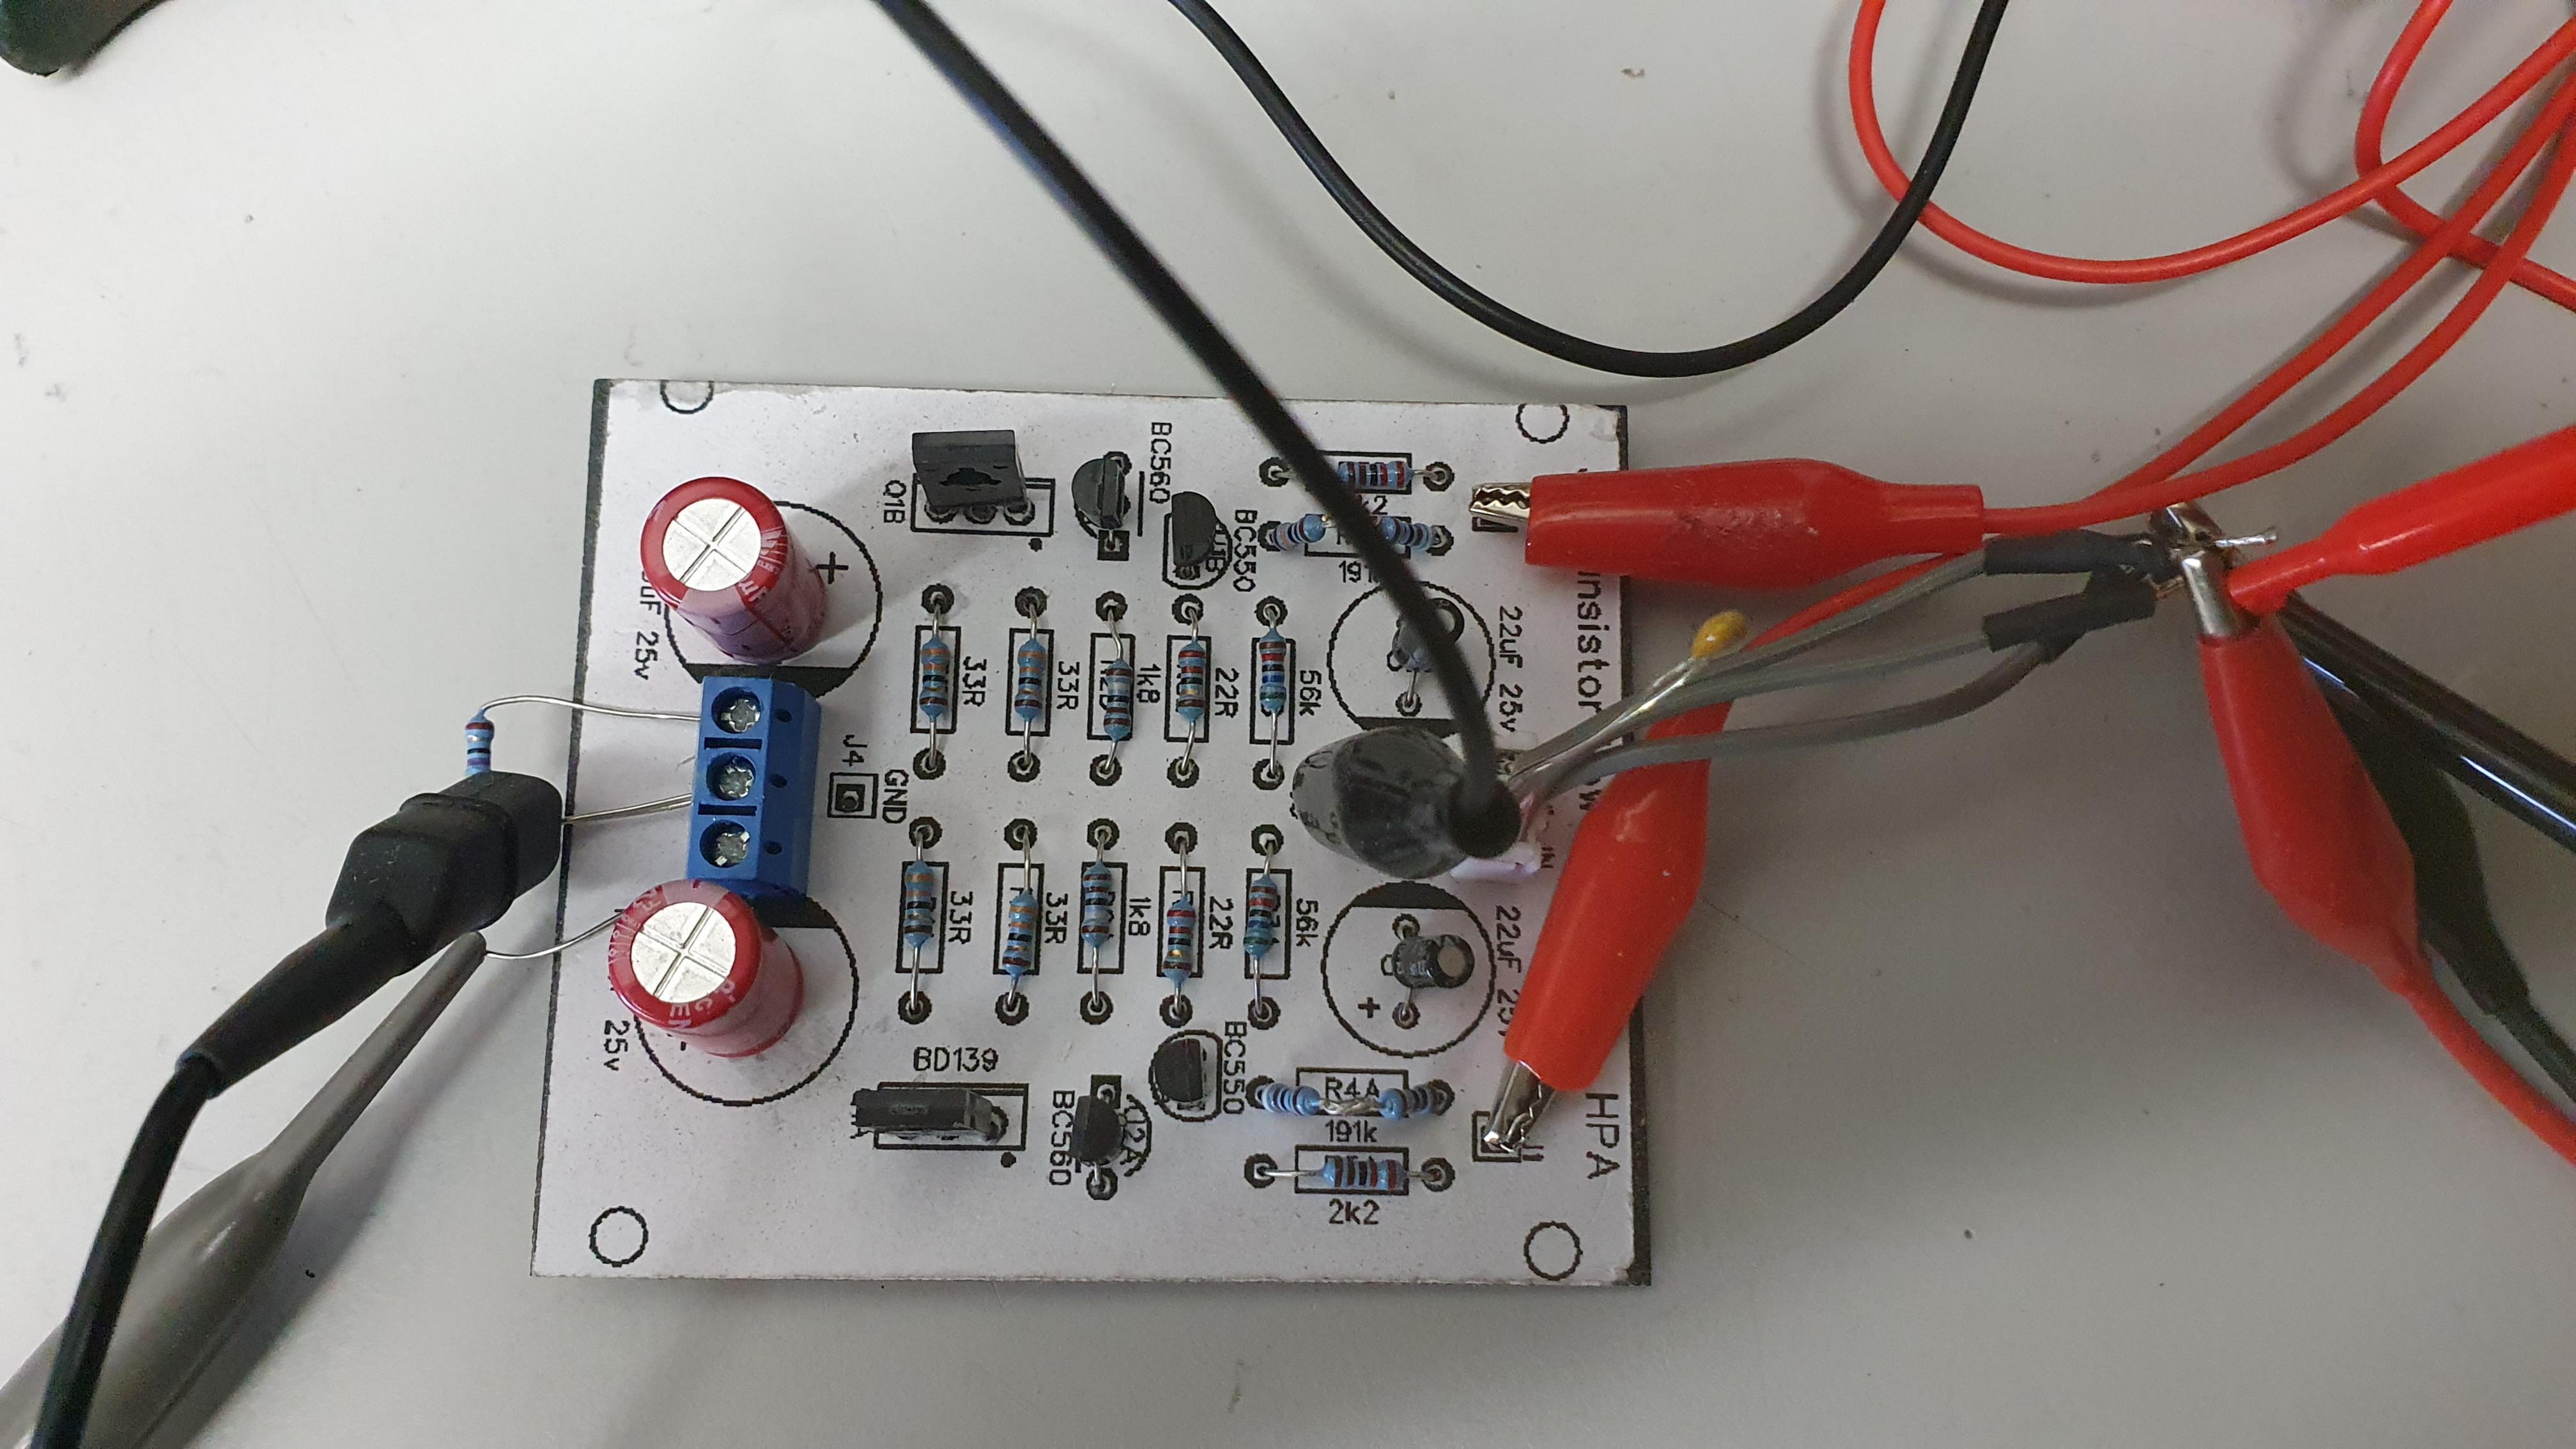 3 Transistor HP Amplifier with low dist-20200922_152533-jpg